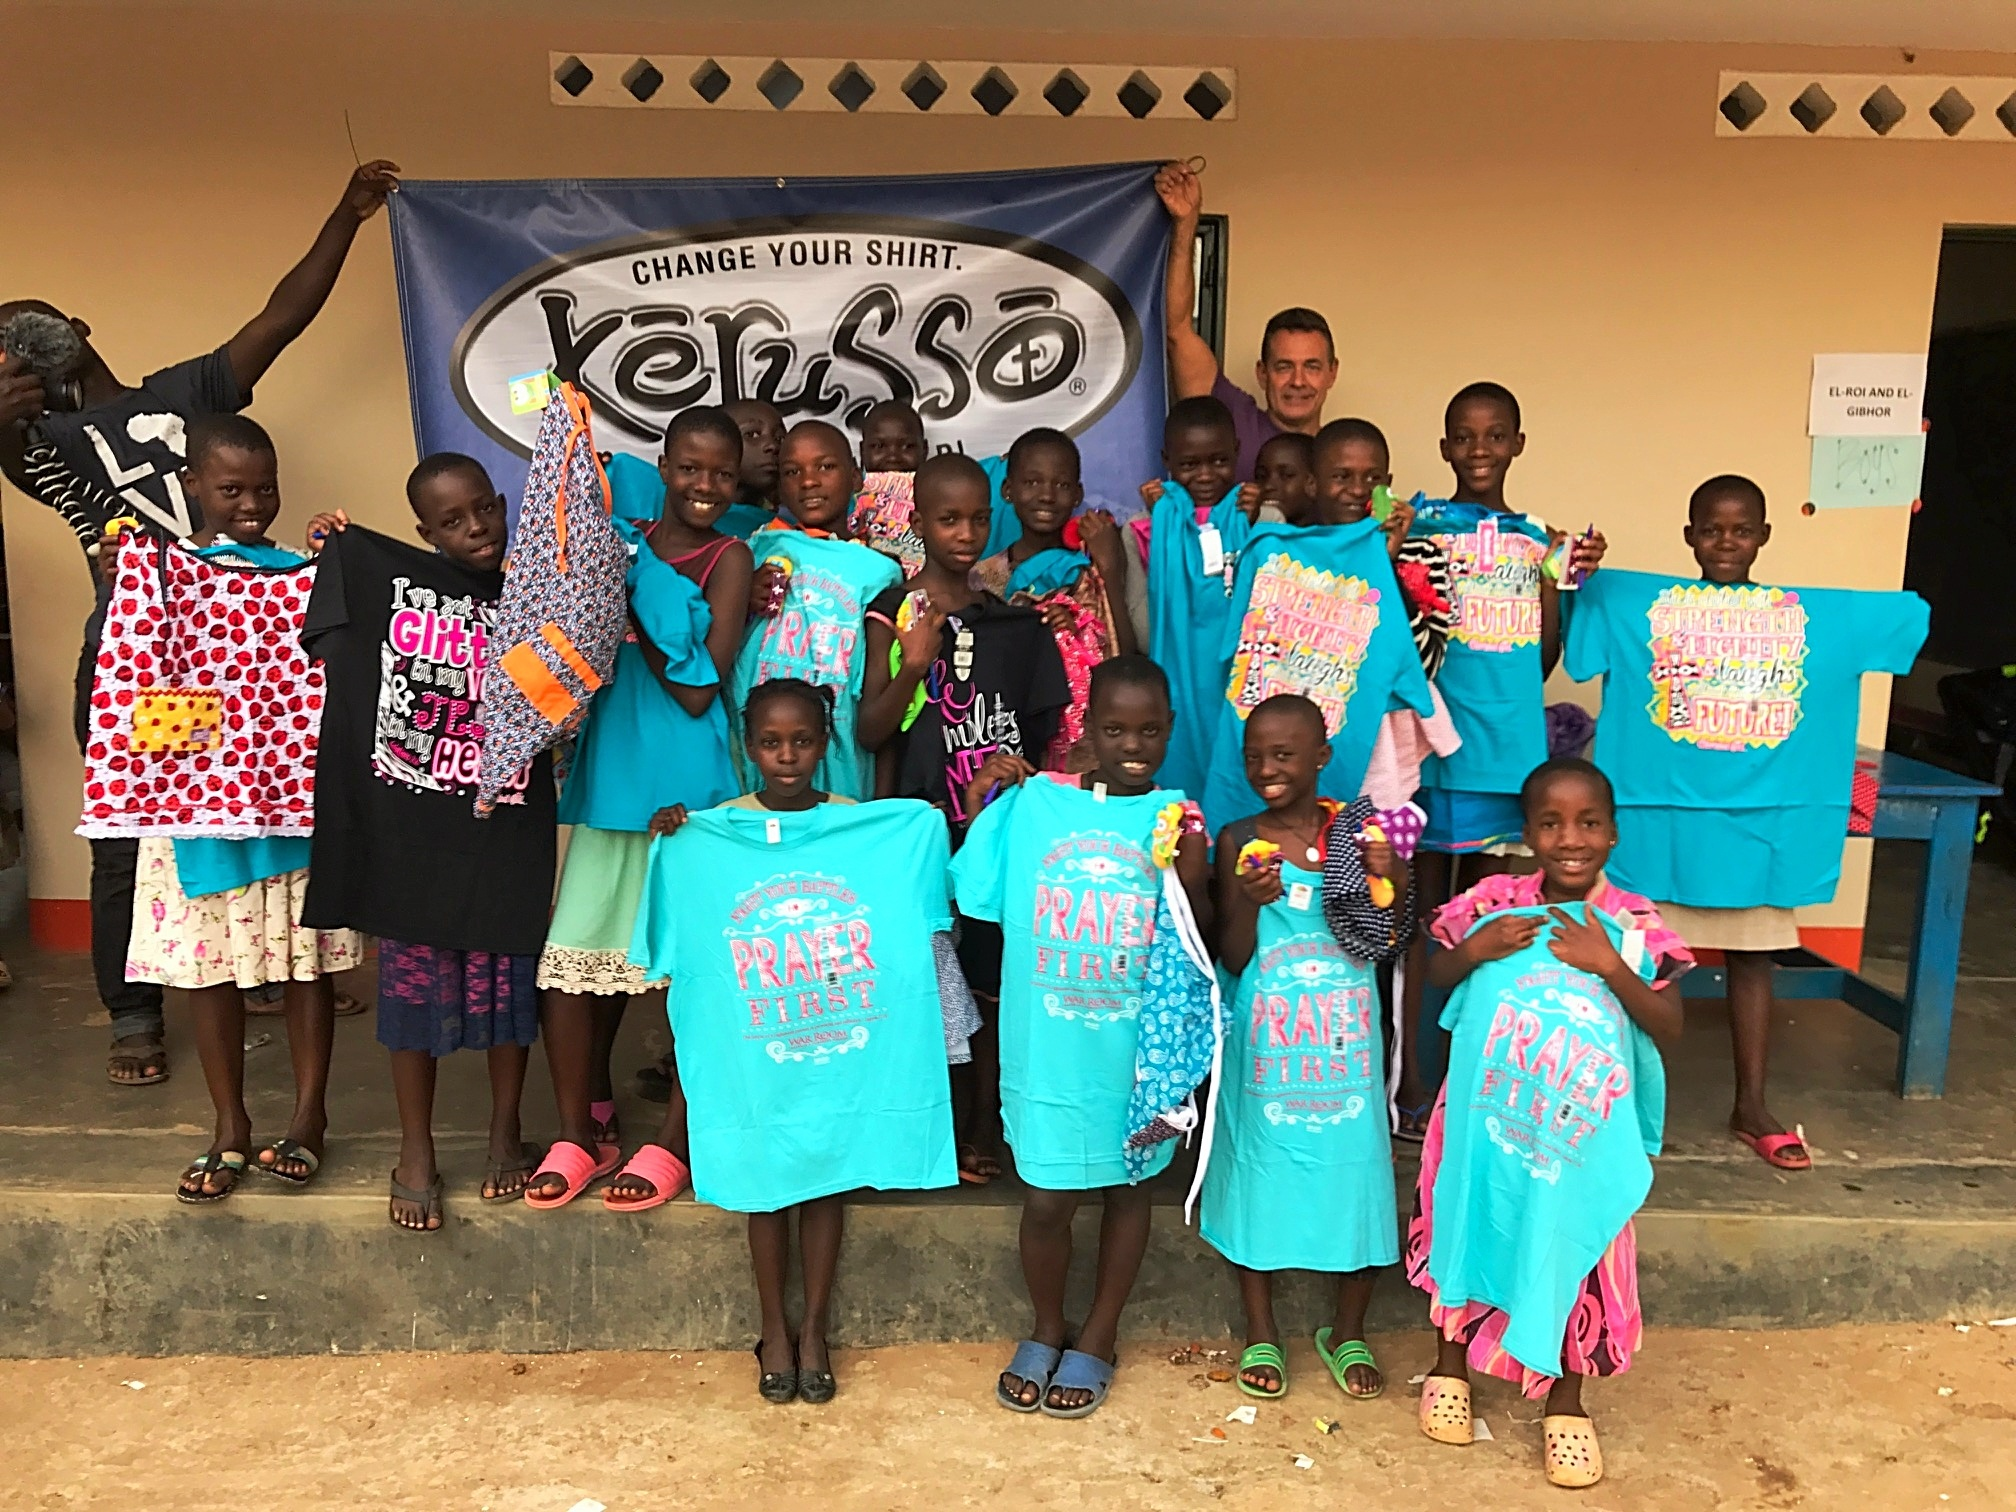 uganda kerusso sign-097436-edited.jpeg